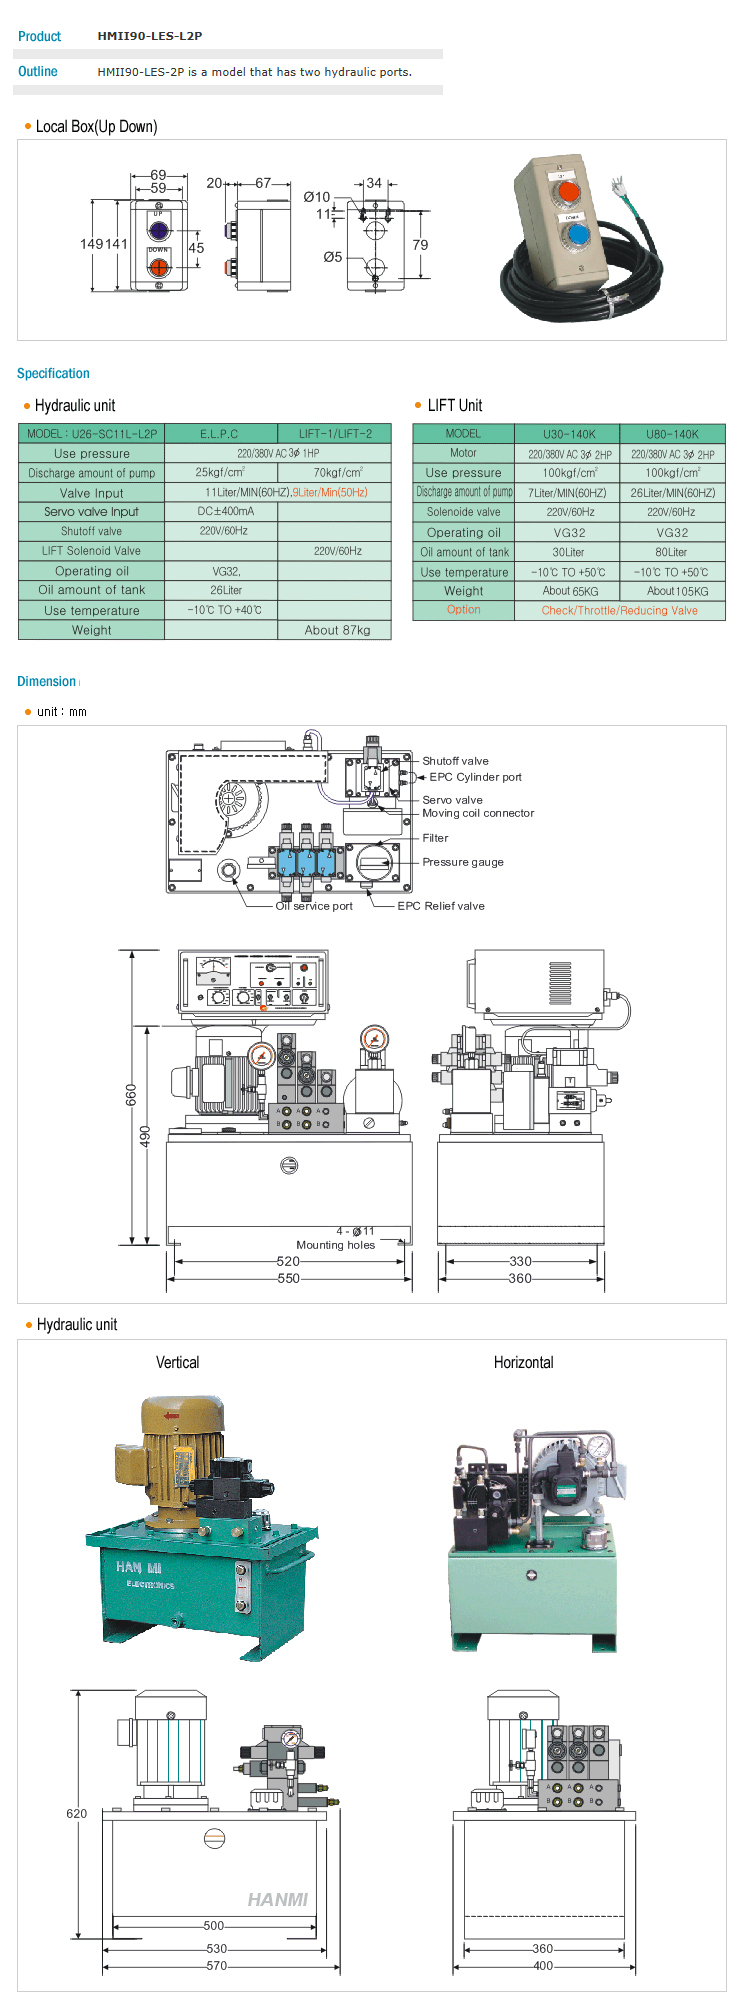 HANMI ELECTRONICS Hydraulic HMII90-LES-L2P